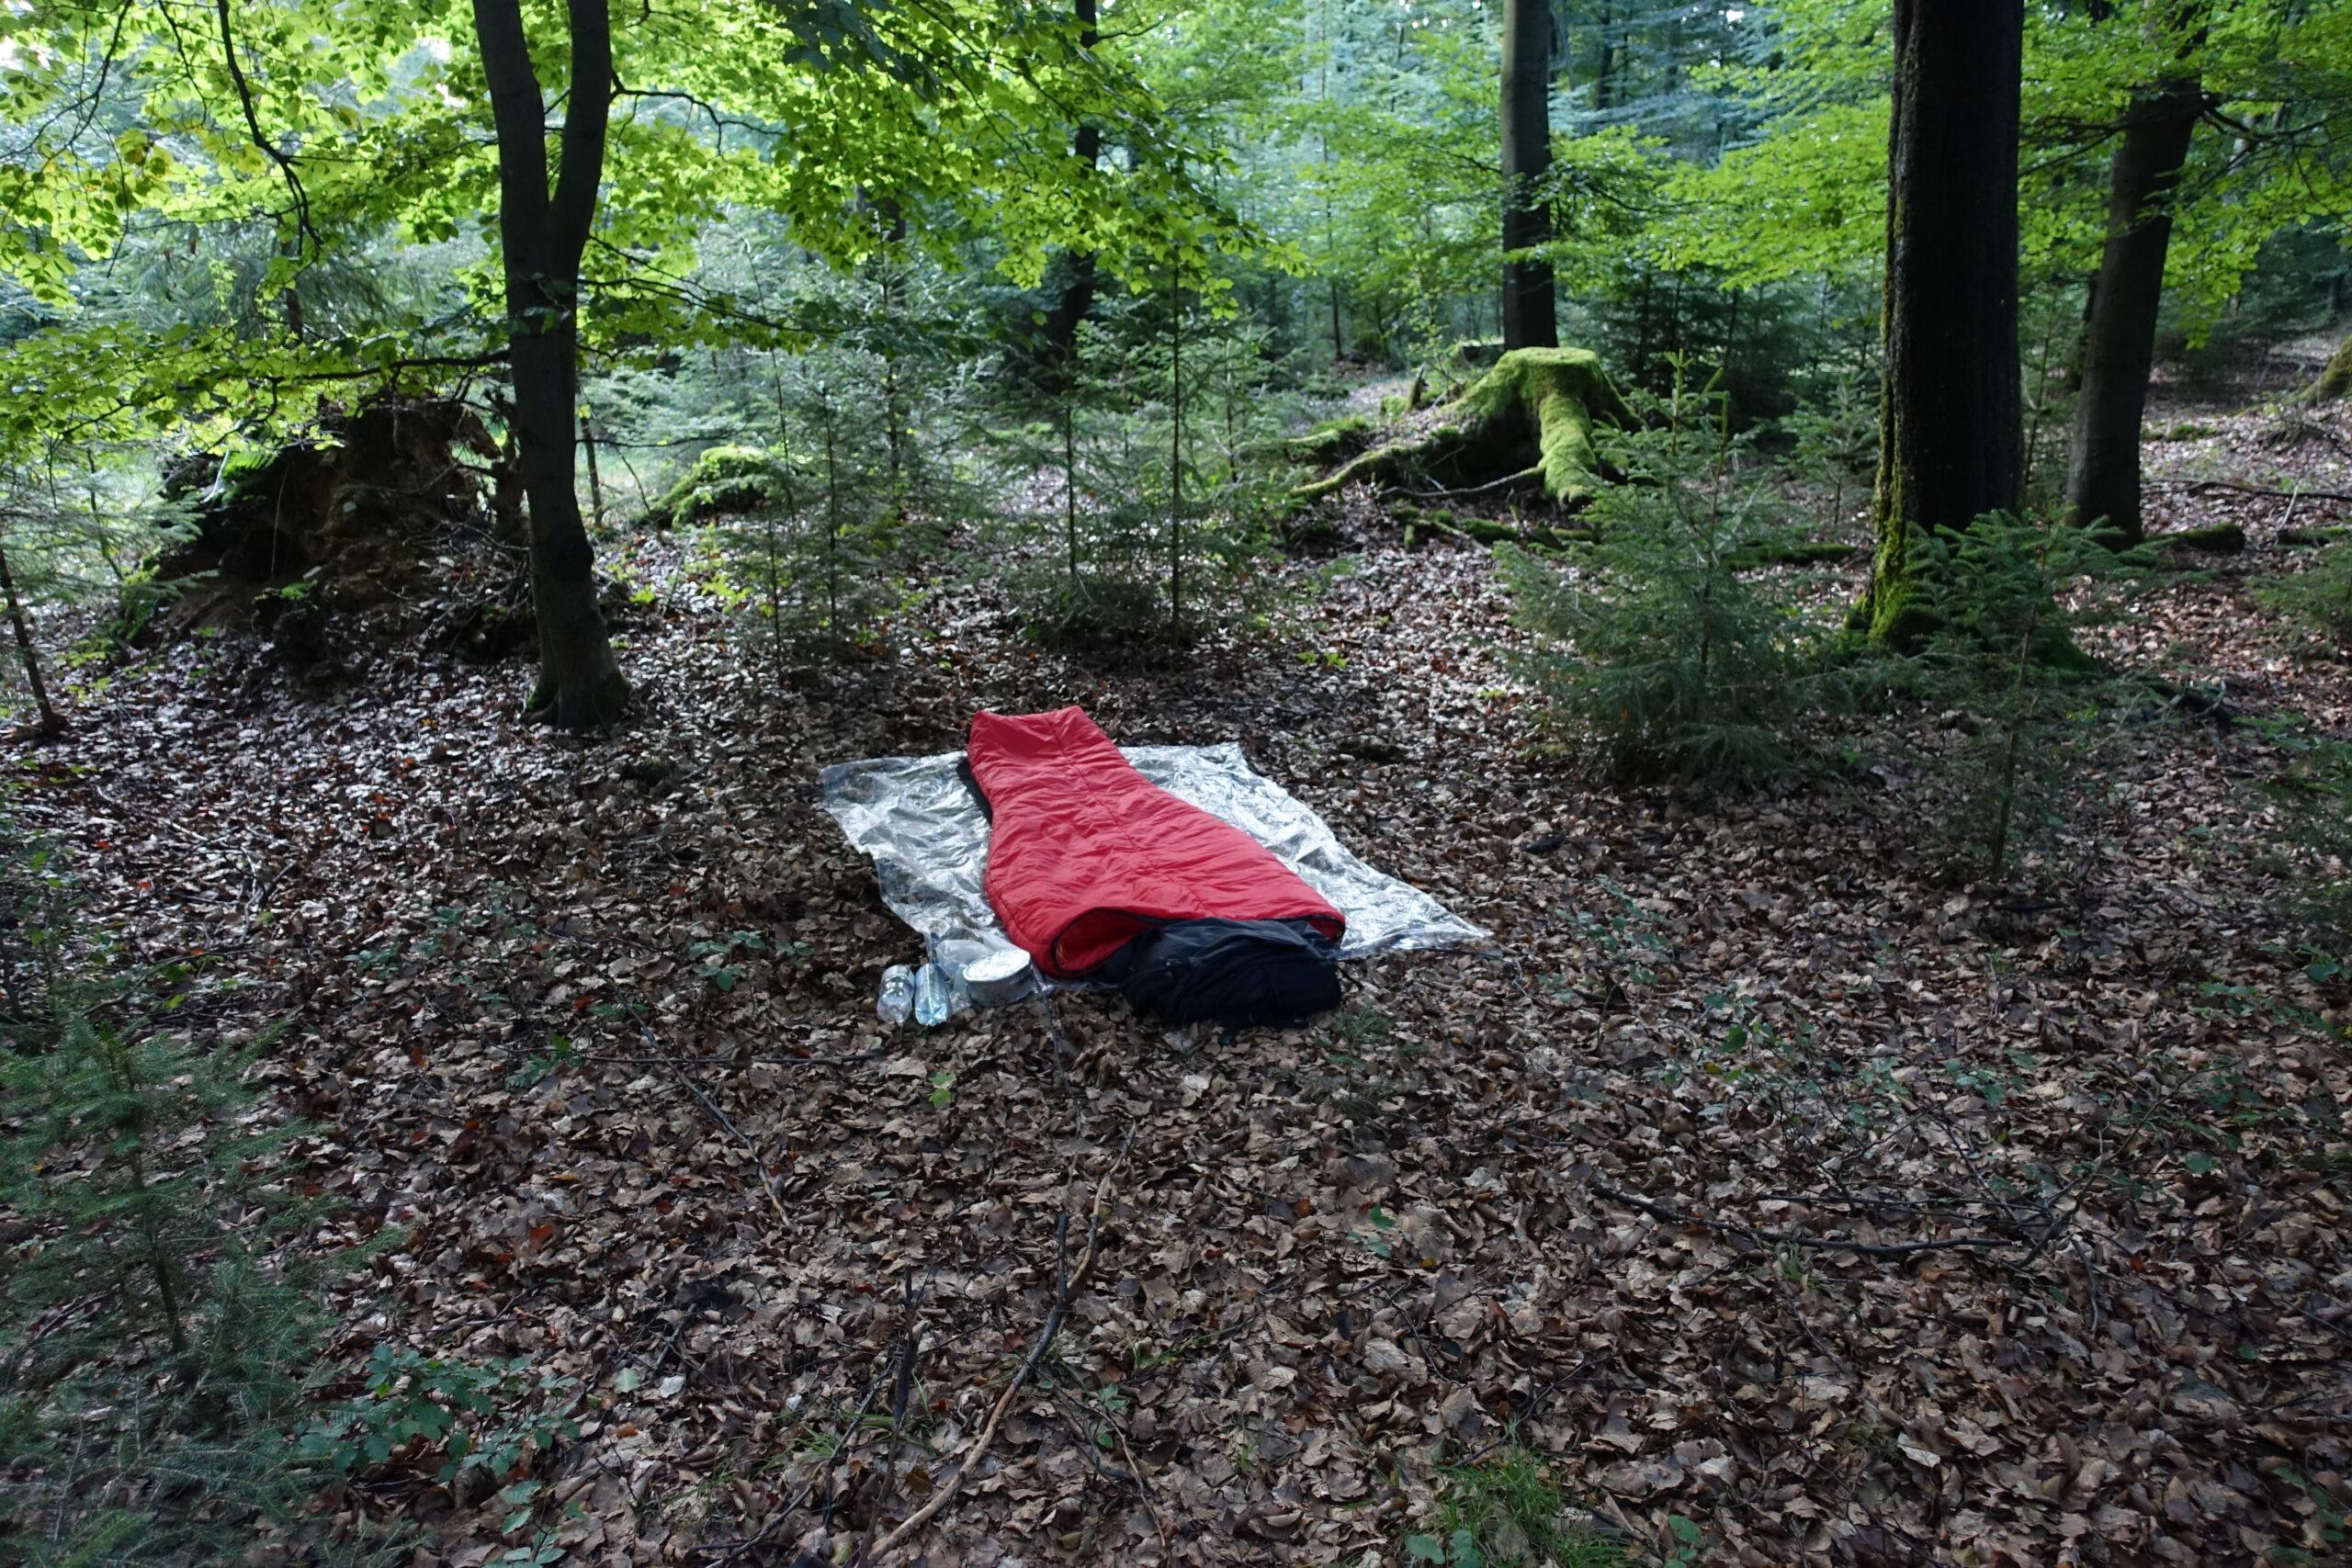 Schlafsack sleepingbag in the woods